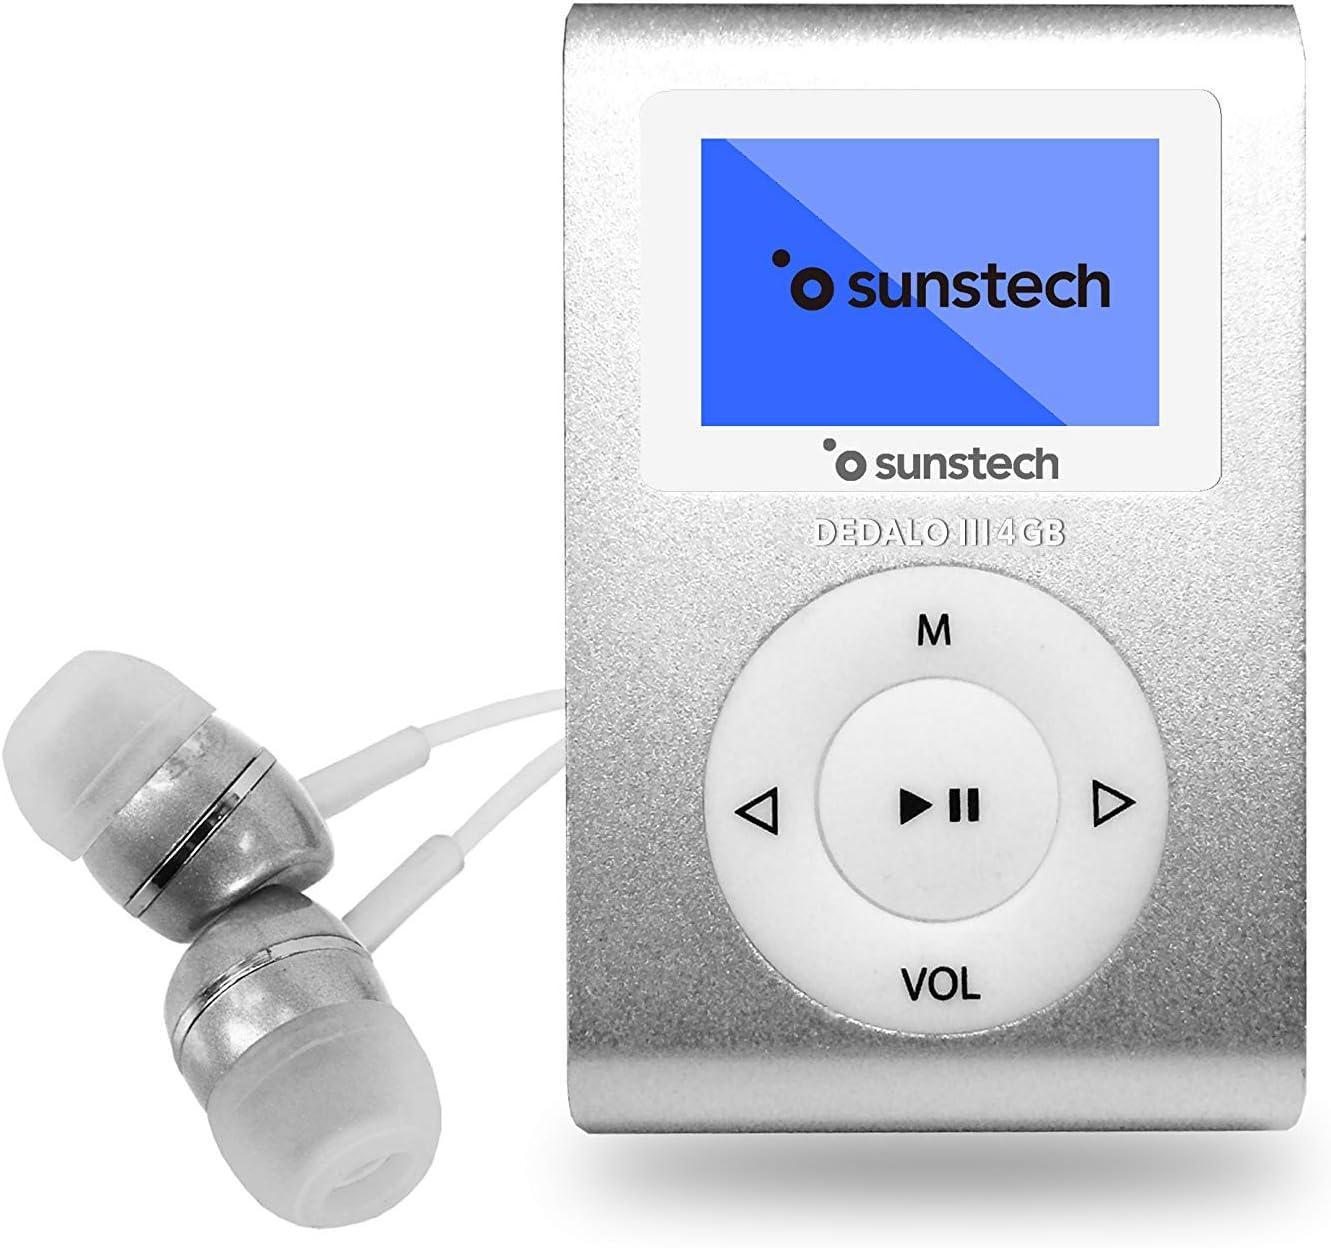 Sunstech DEDALOIII - Reproductor MP3 de 1.1, 4 GB, color plata ...